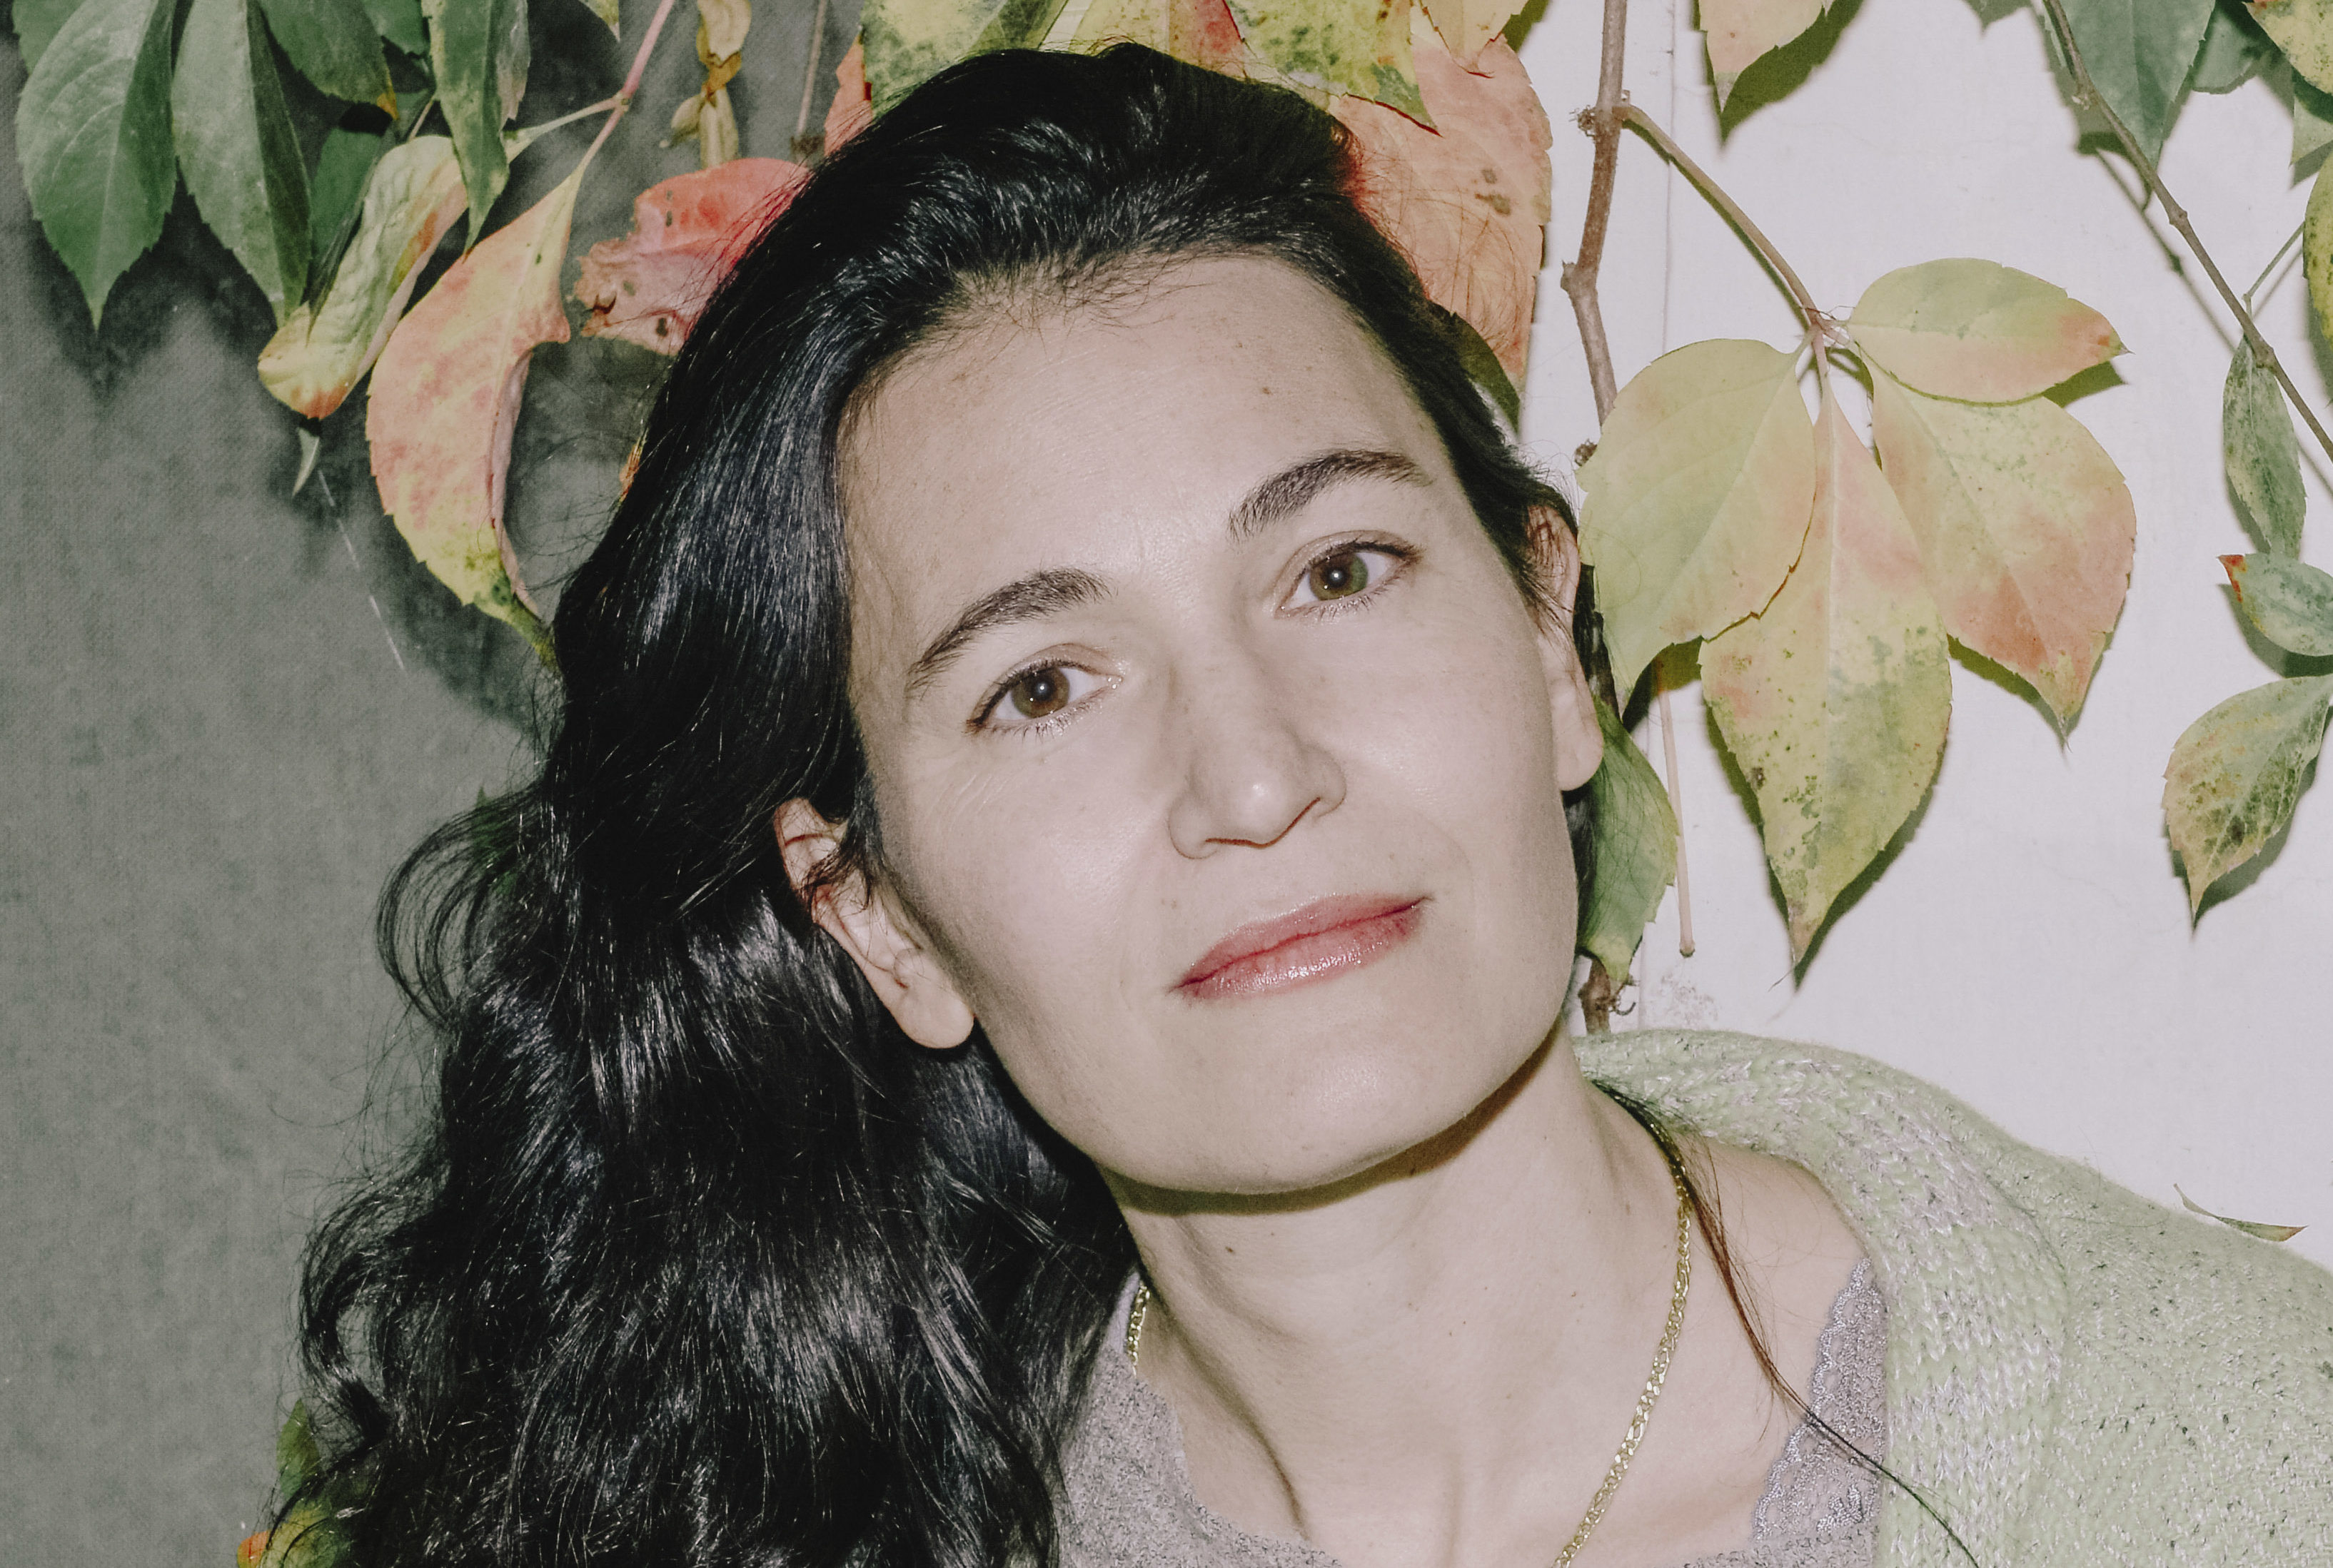 Author Nicole Krauss (Photo/Gani Riskin)